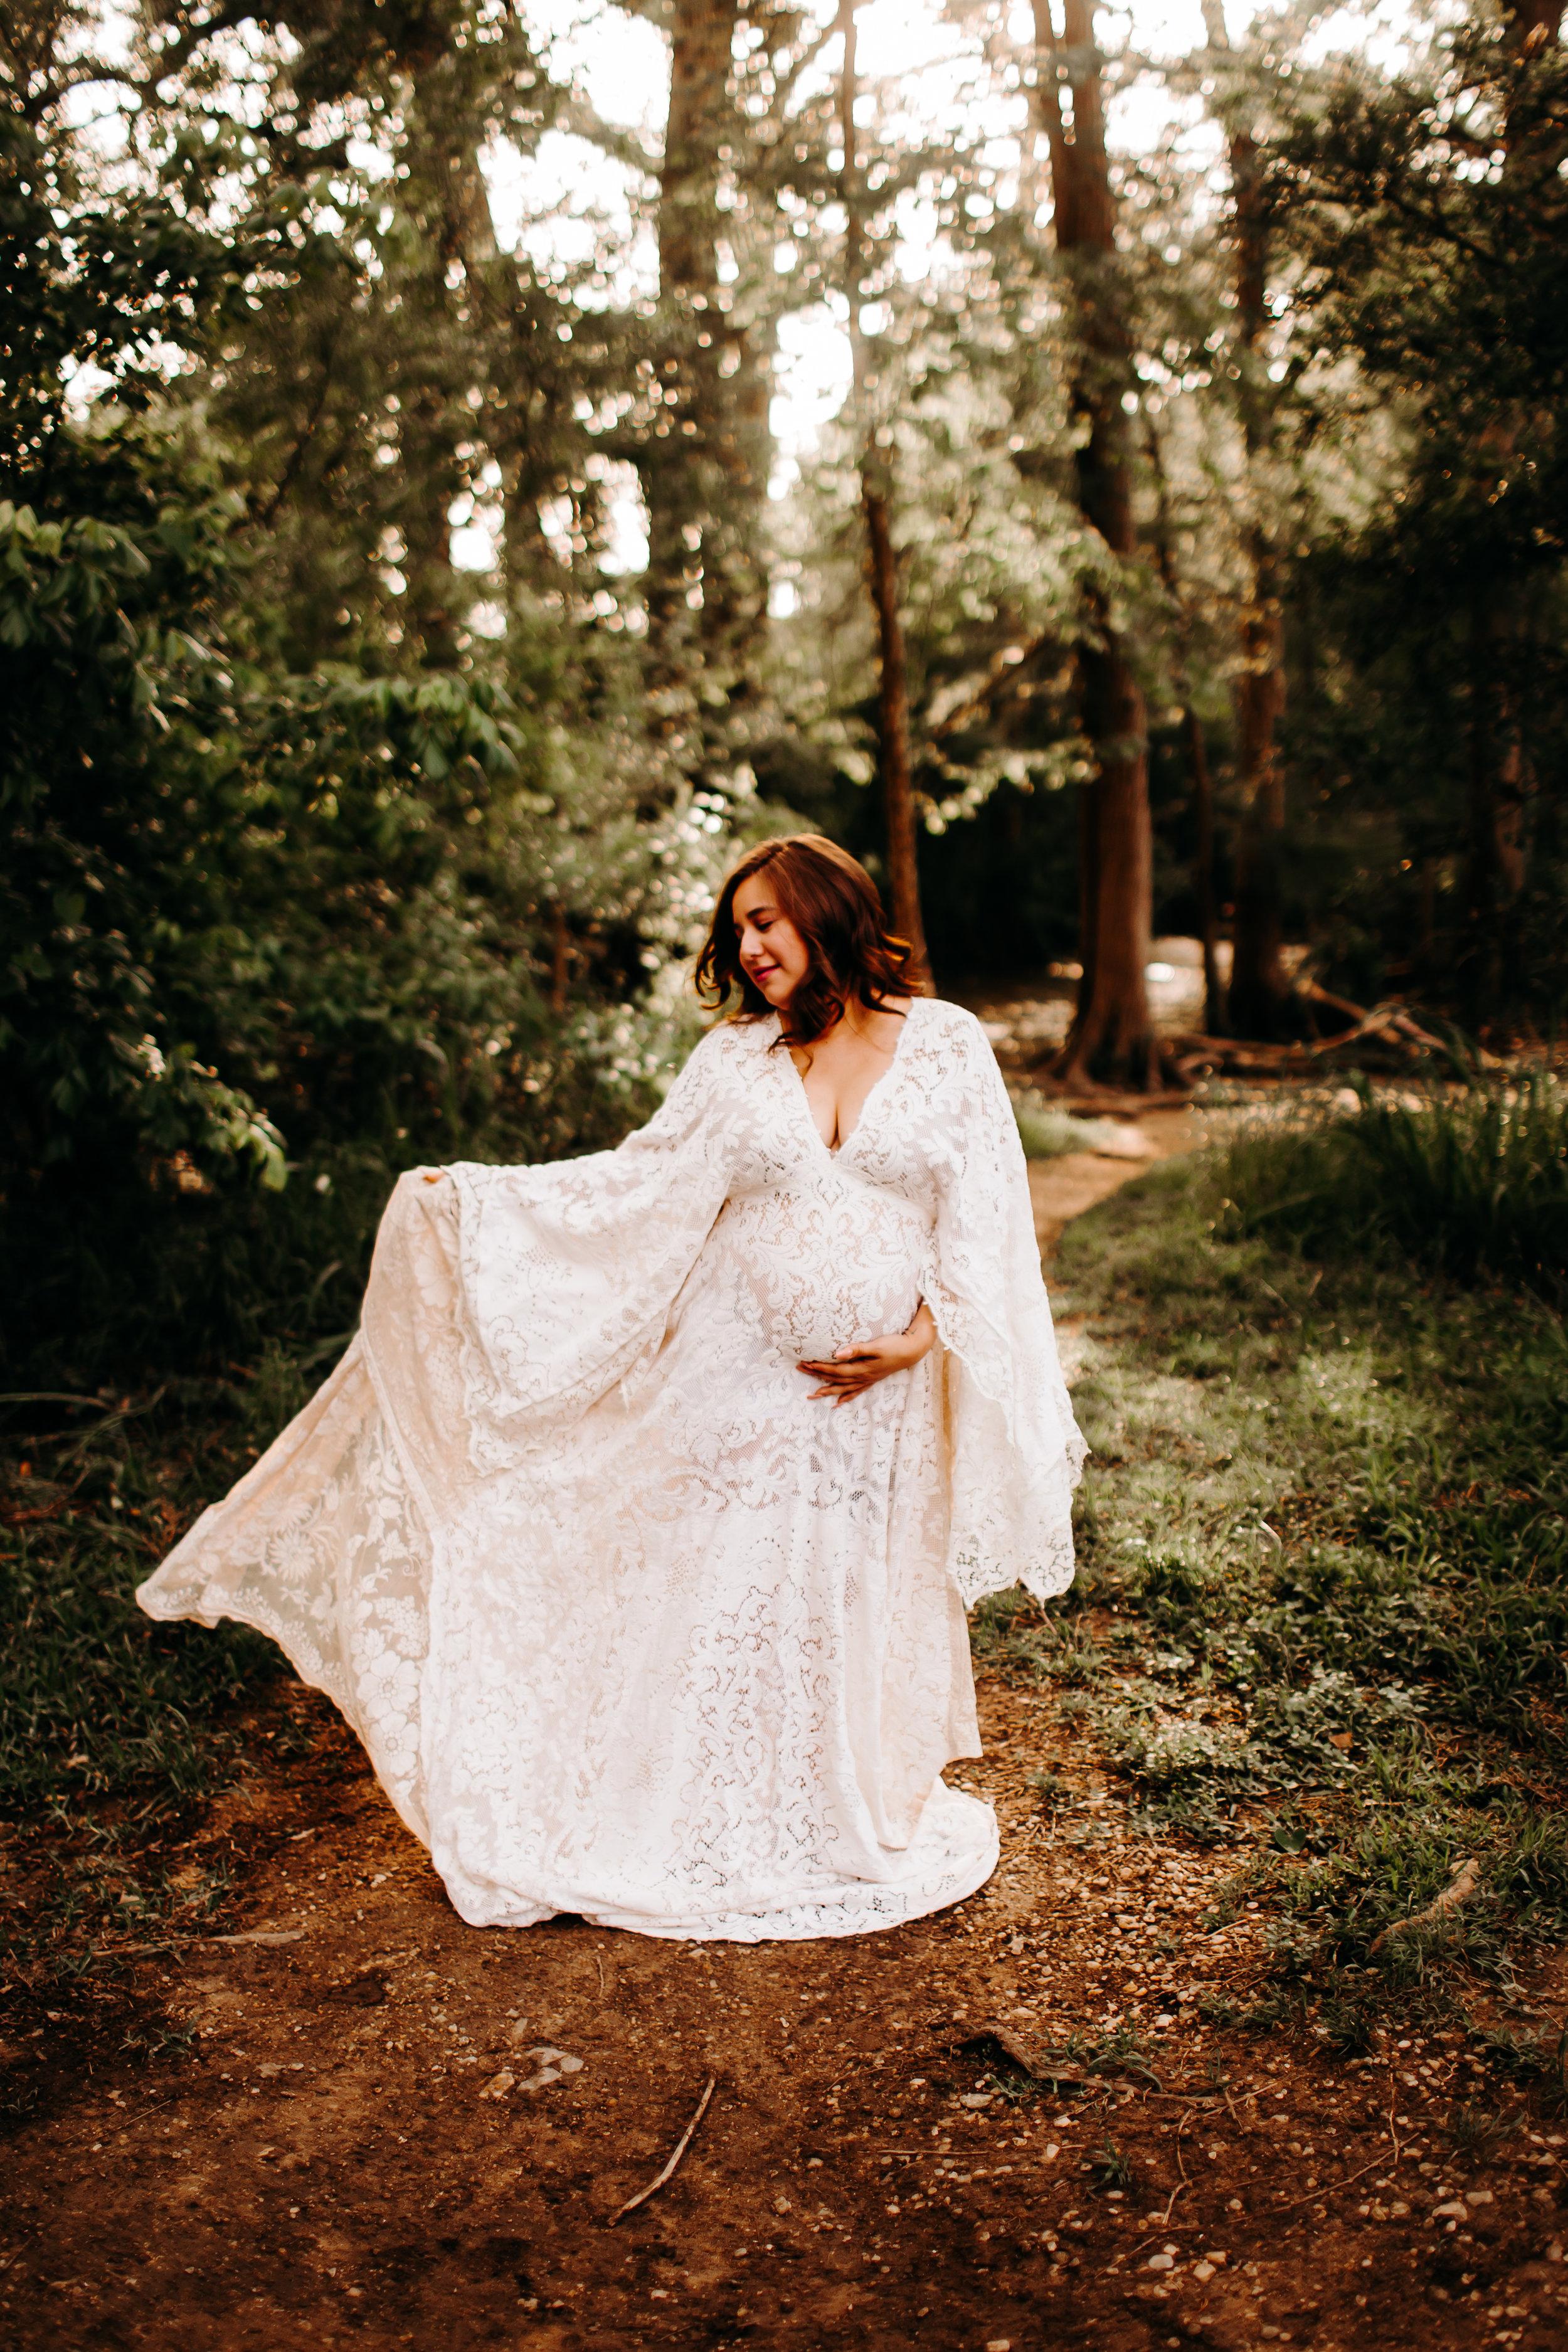 Tiffany-San-Antonio-Maternity-Photographer-40.jpg